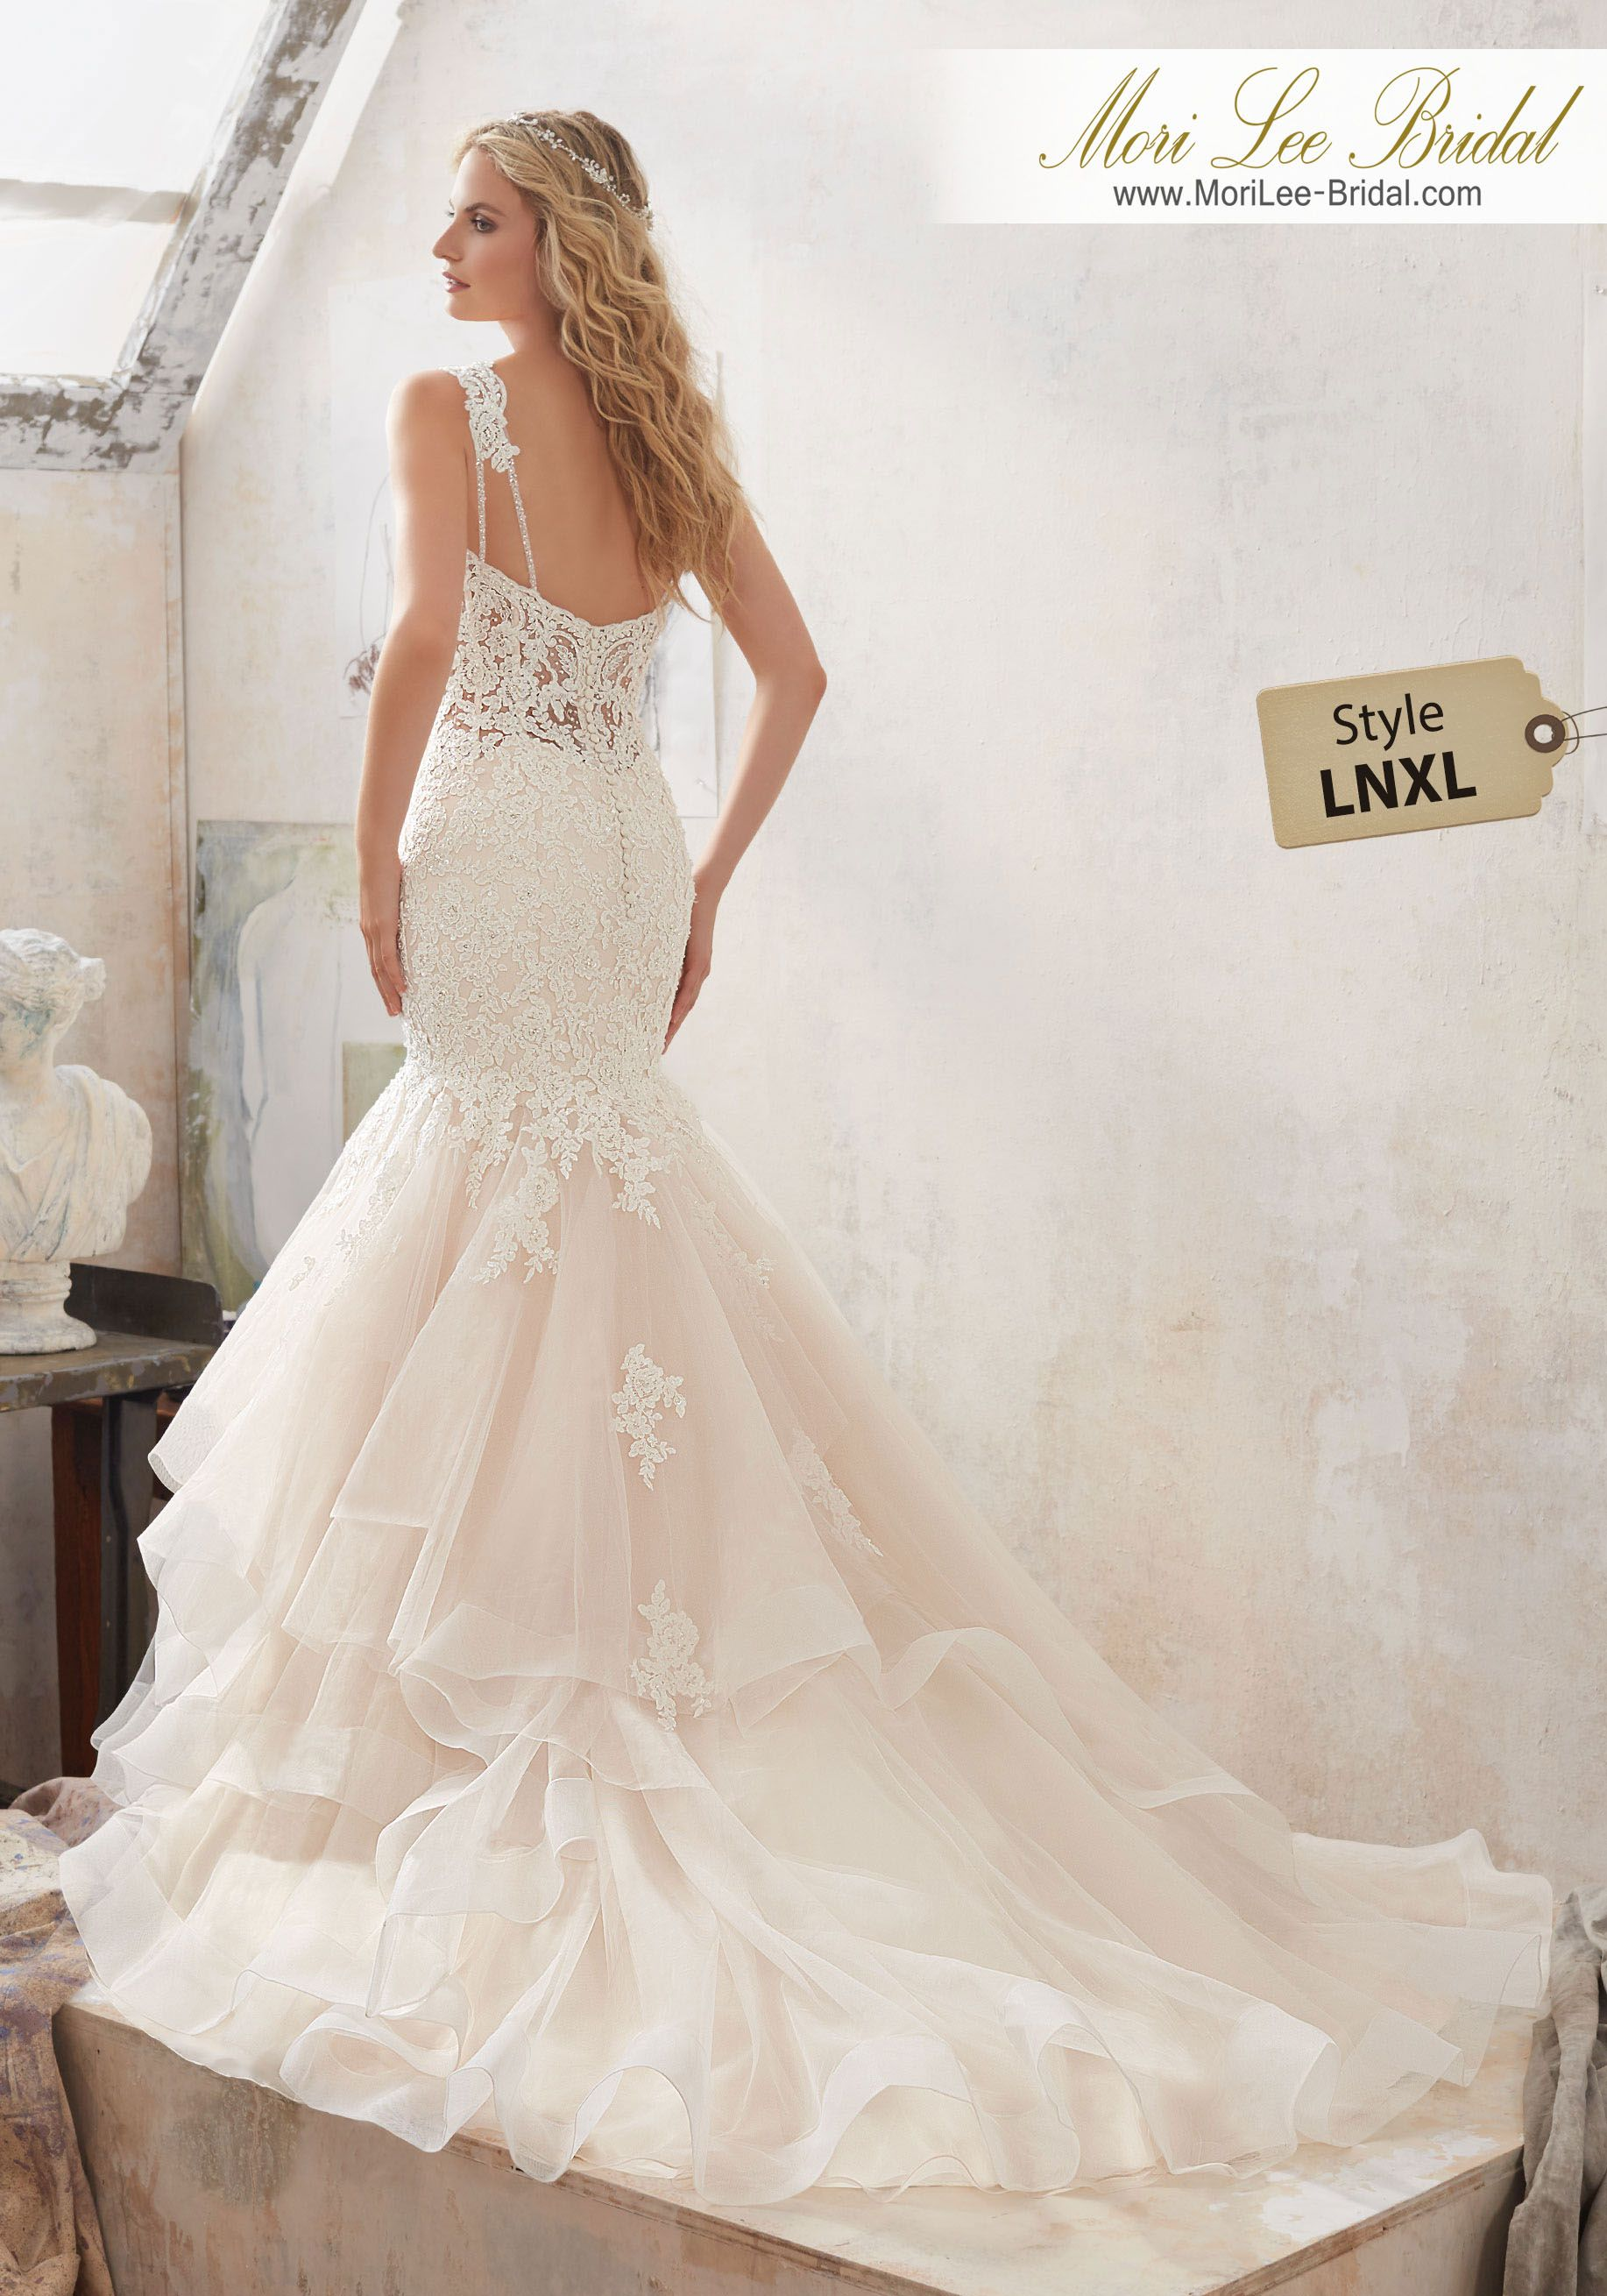 Style lnxl marciela wedding dress diamantŽ beaded alen çon lace